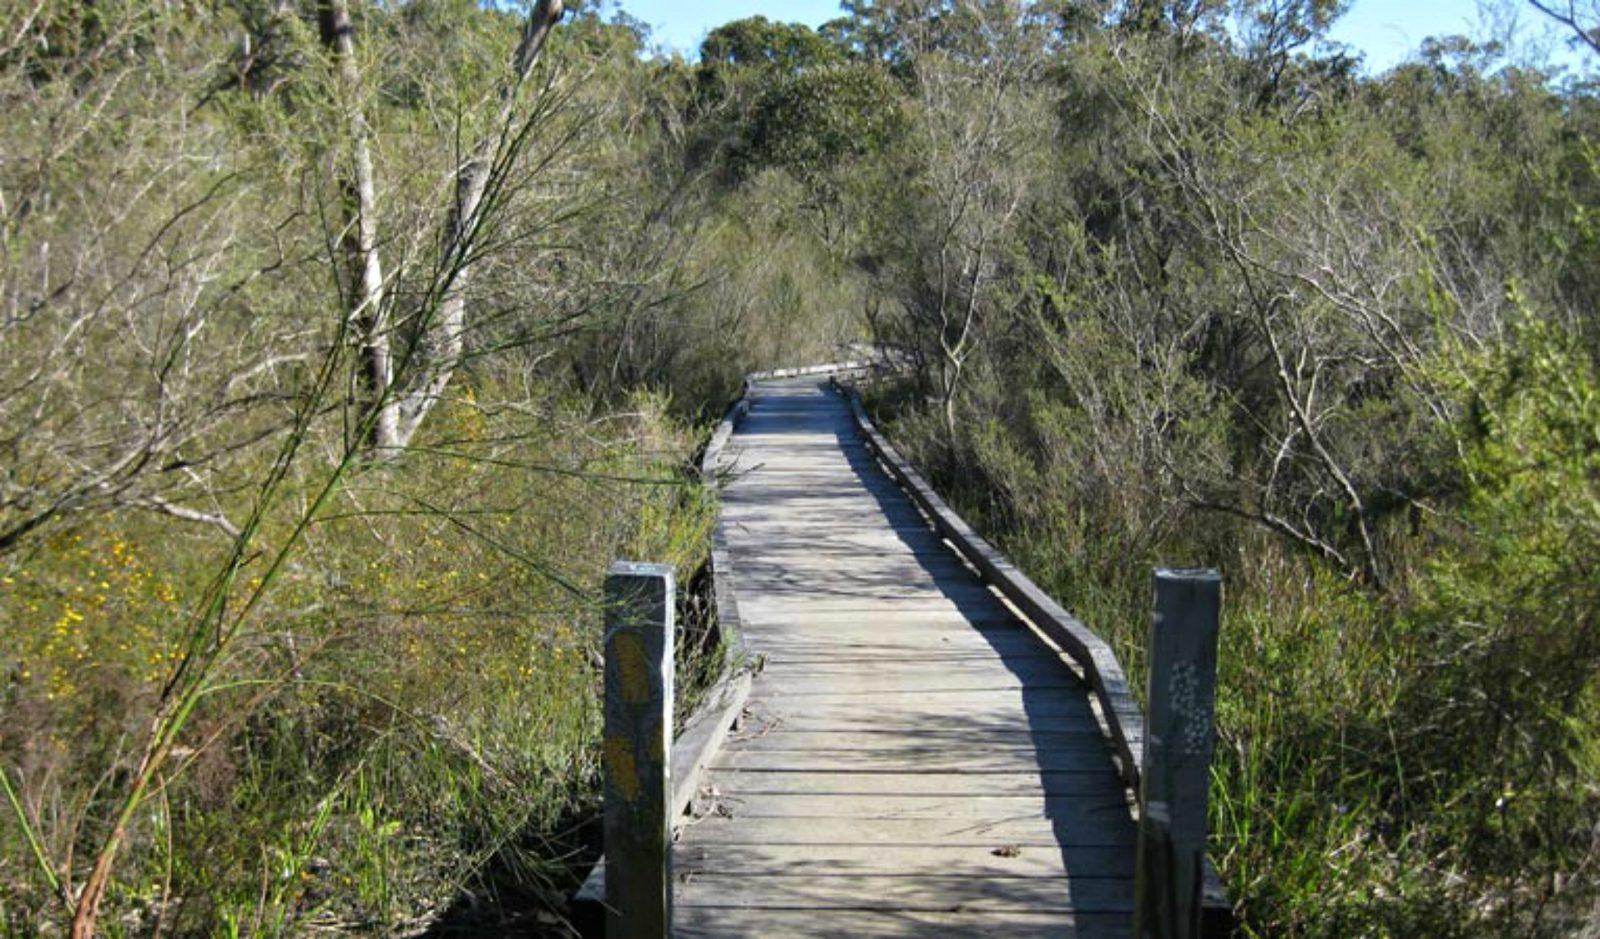 Falcon Crescent boardwalk, Bomaderry Creek Regional Park